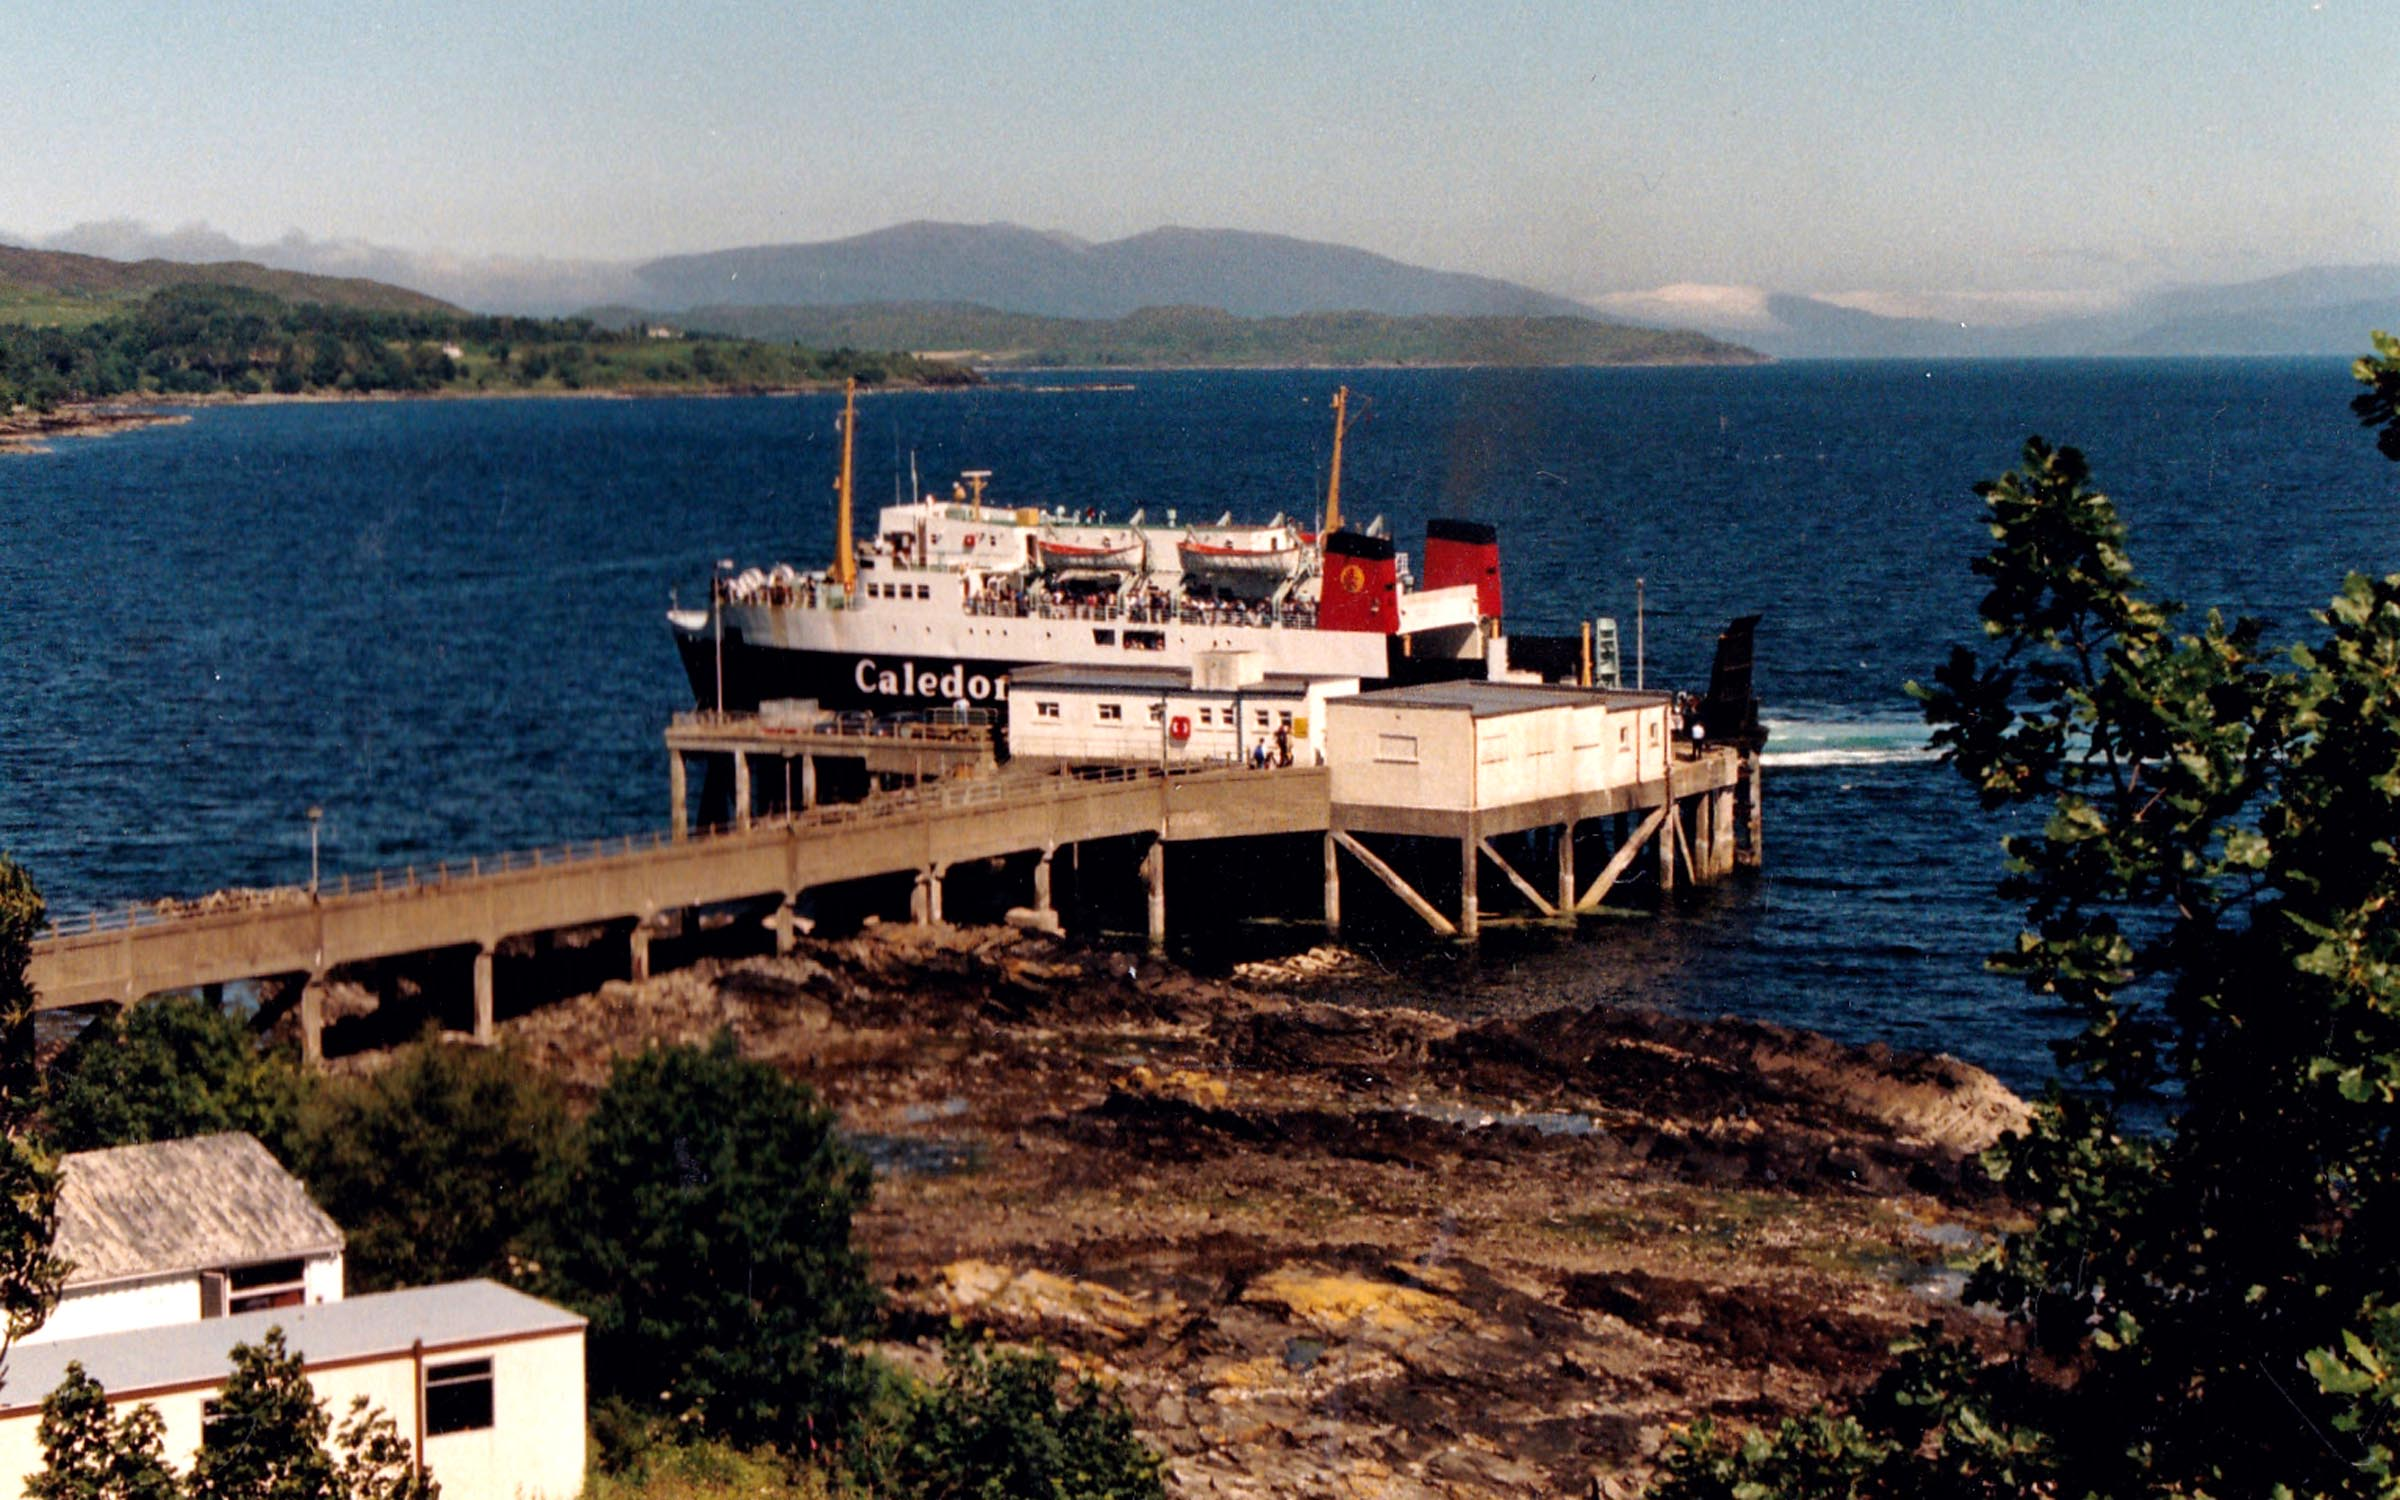 Iona leaving Armadale (Jim AIkman Smith)